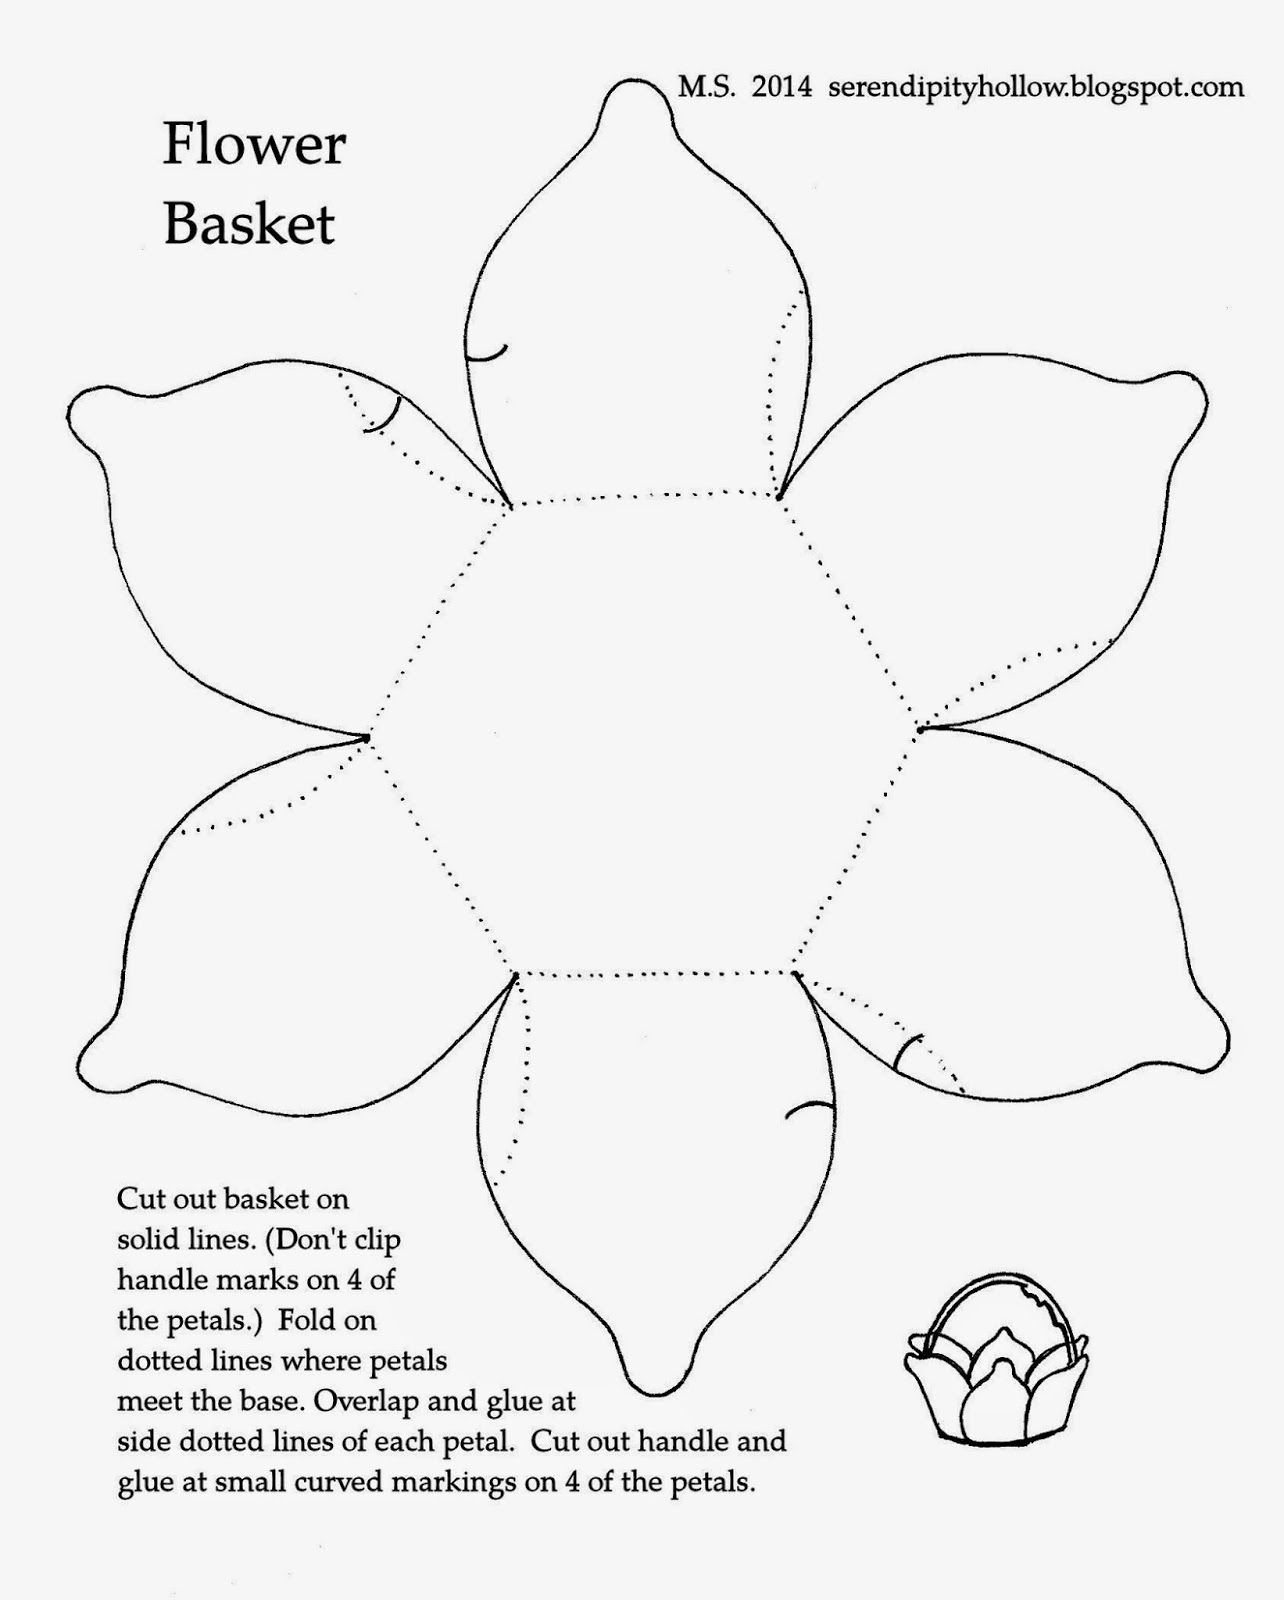 Serendipity Hollow: Tiny Easter Baskets | ПАСХА | Pinterest ...